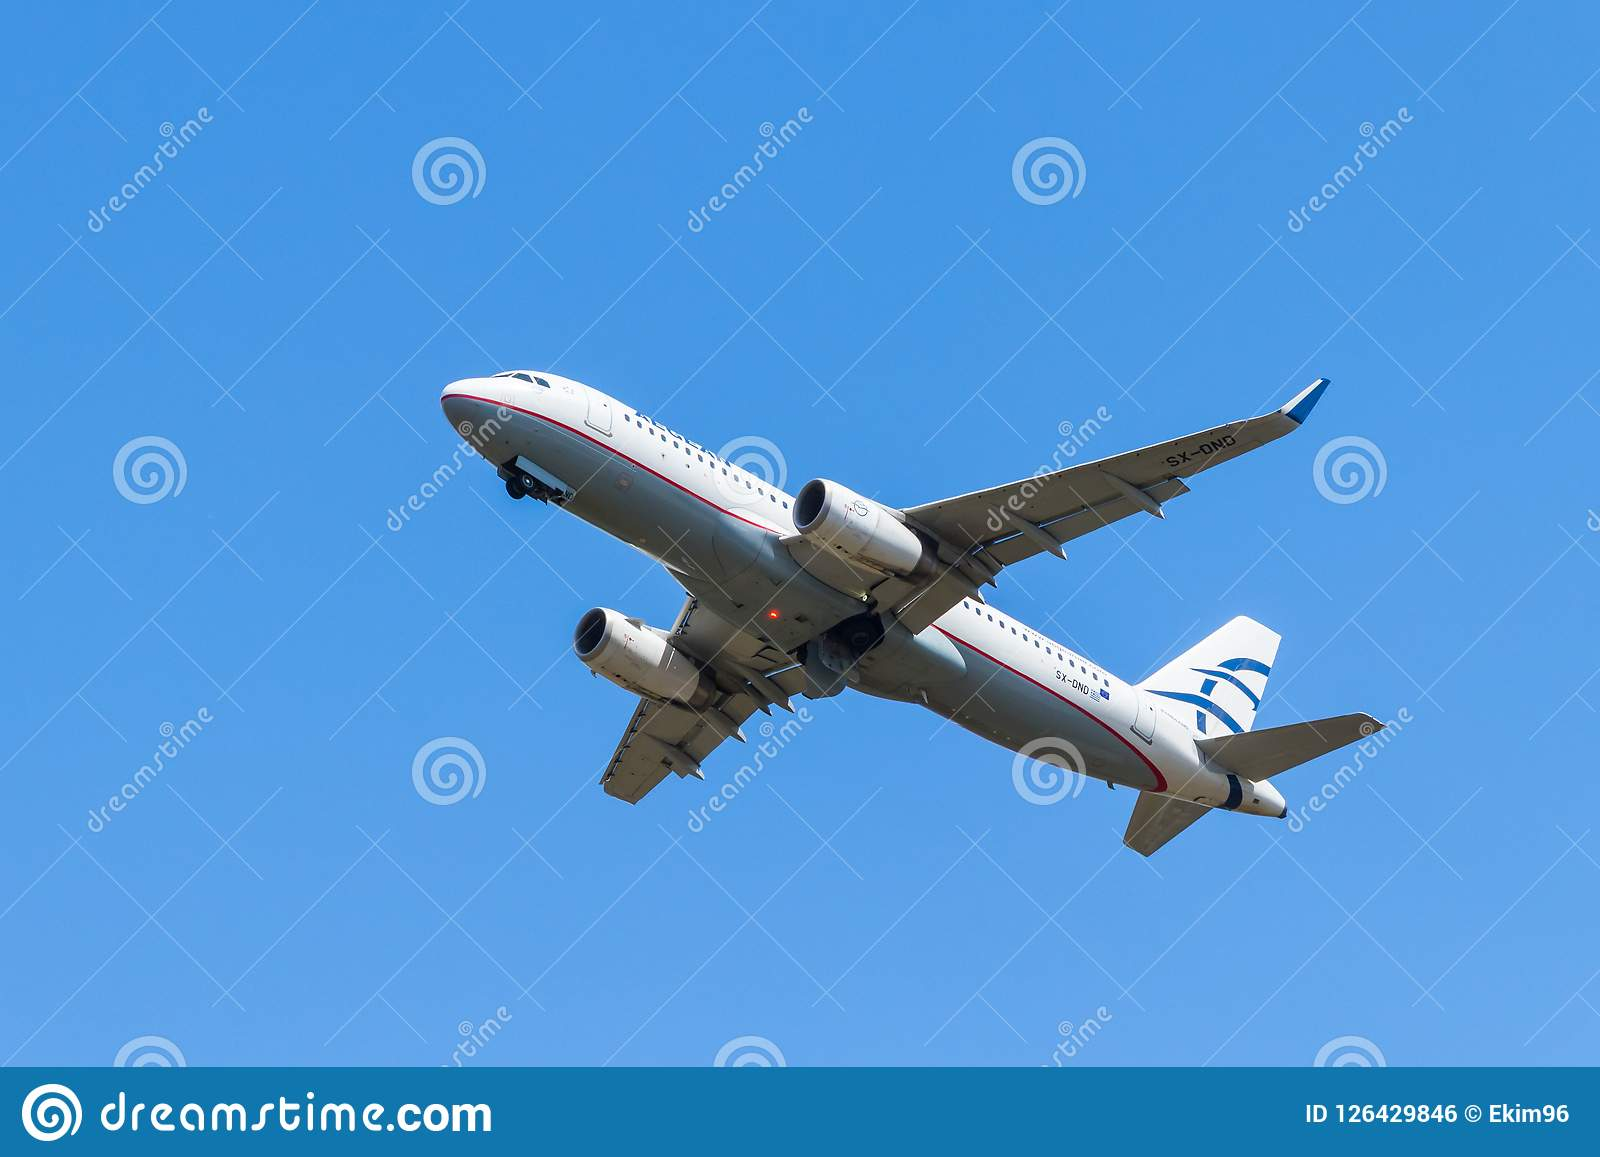 BERLIM, ALEMANHA - 7 DE JULHO DE 2018: Aegean Airlines, Airbus A320-232